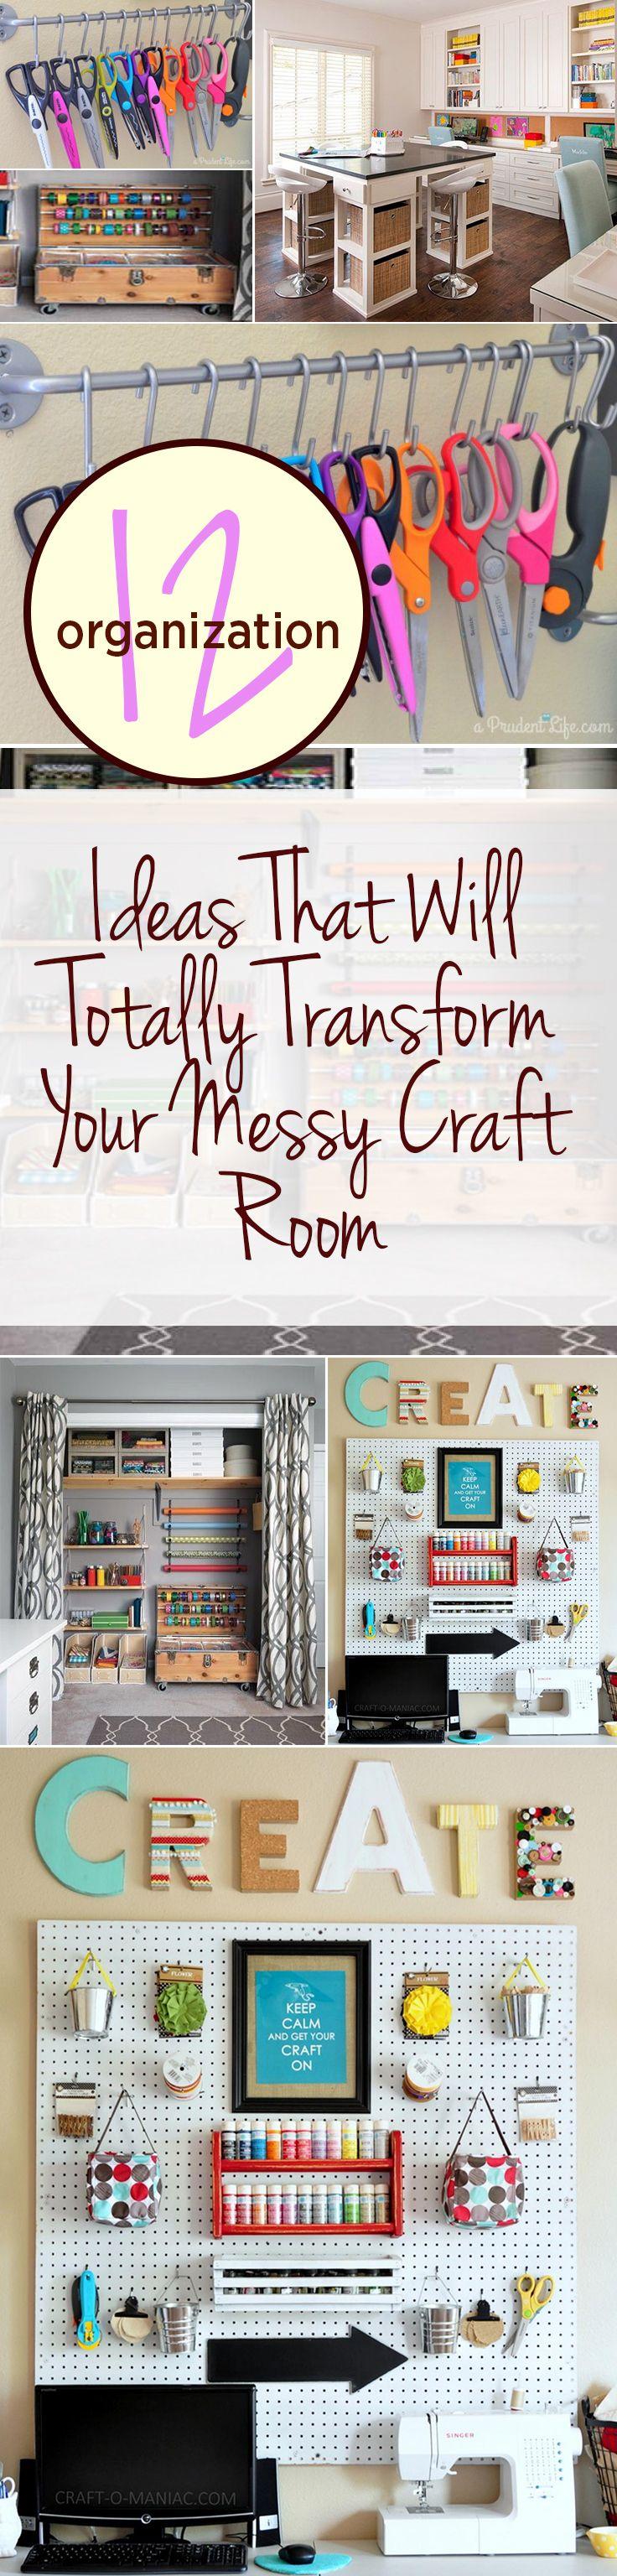 Cindy S Scrapbook Room Messy Craft Room Organization Scrapbook